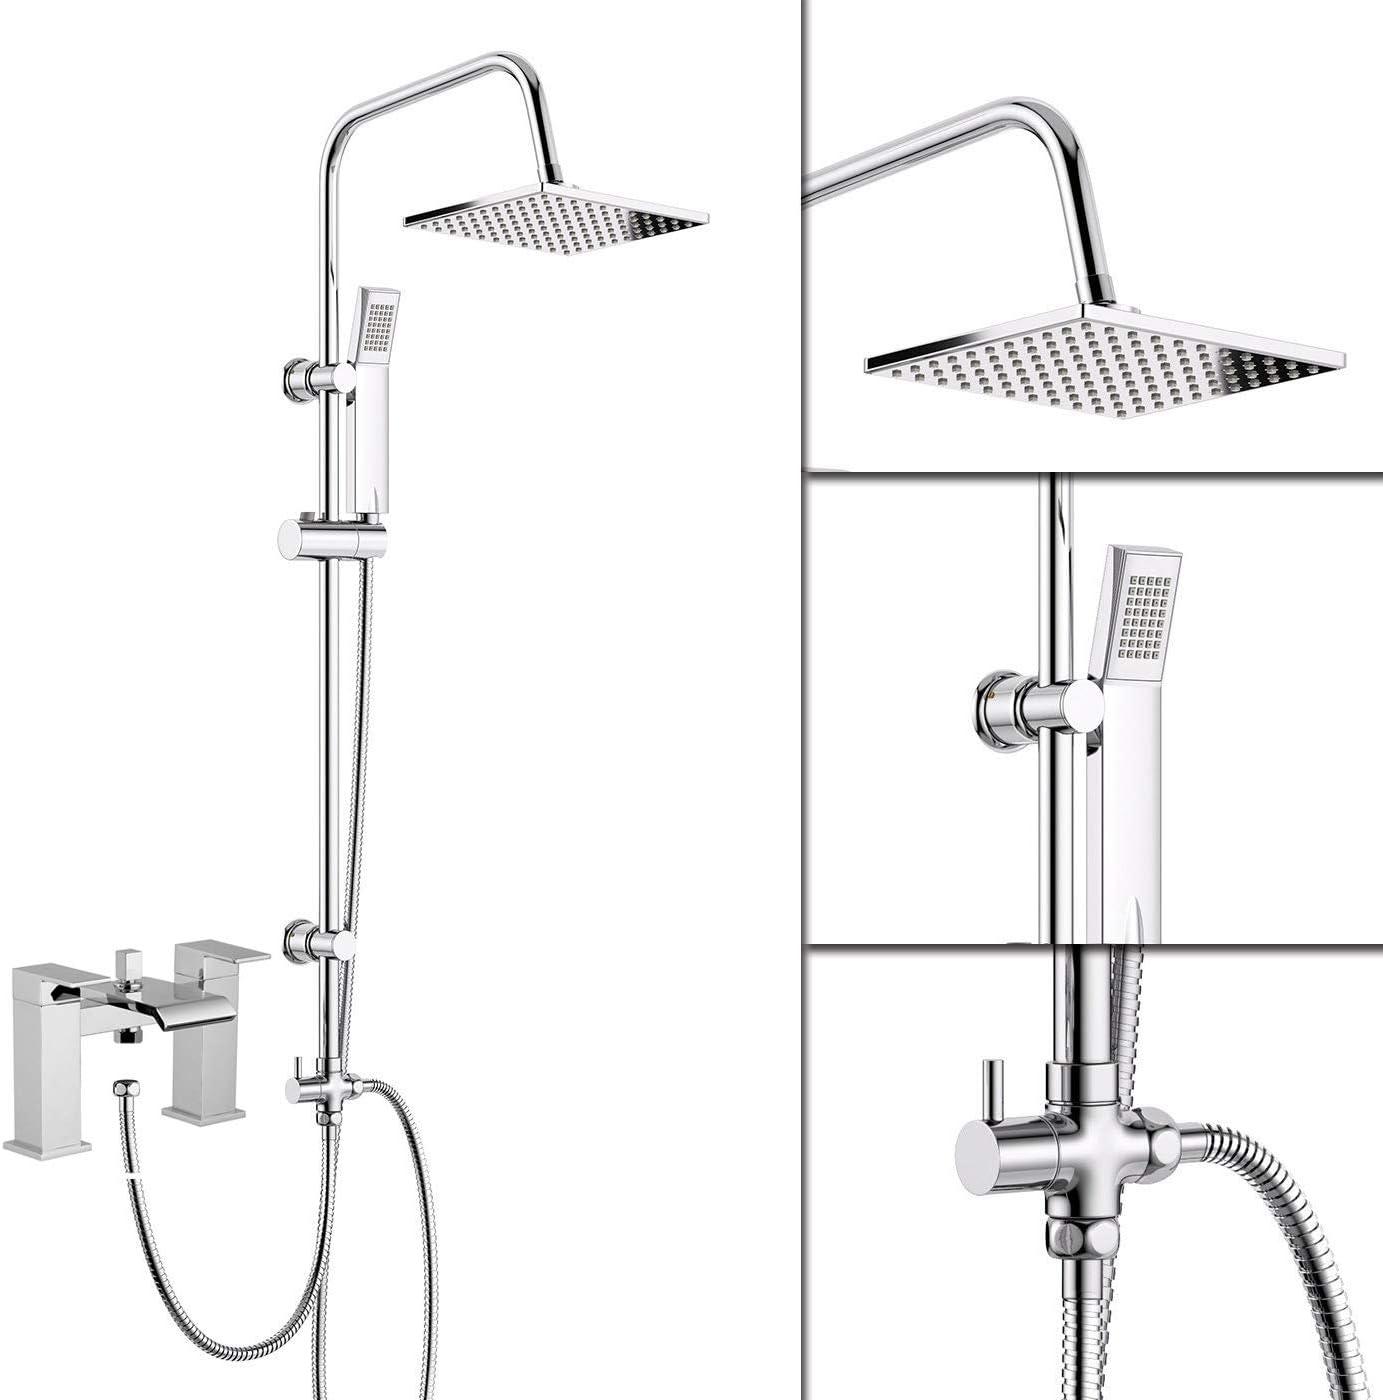 Bath Shower Mixer Tap /& Square 3 Way Shower Rigid Riser Kit Chrome Modern